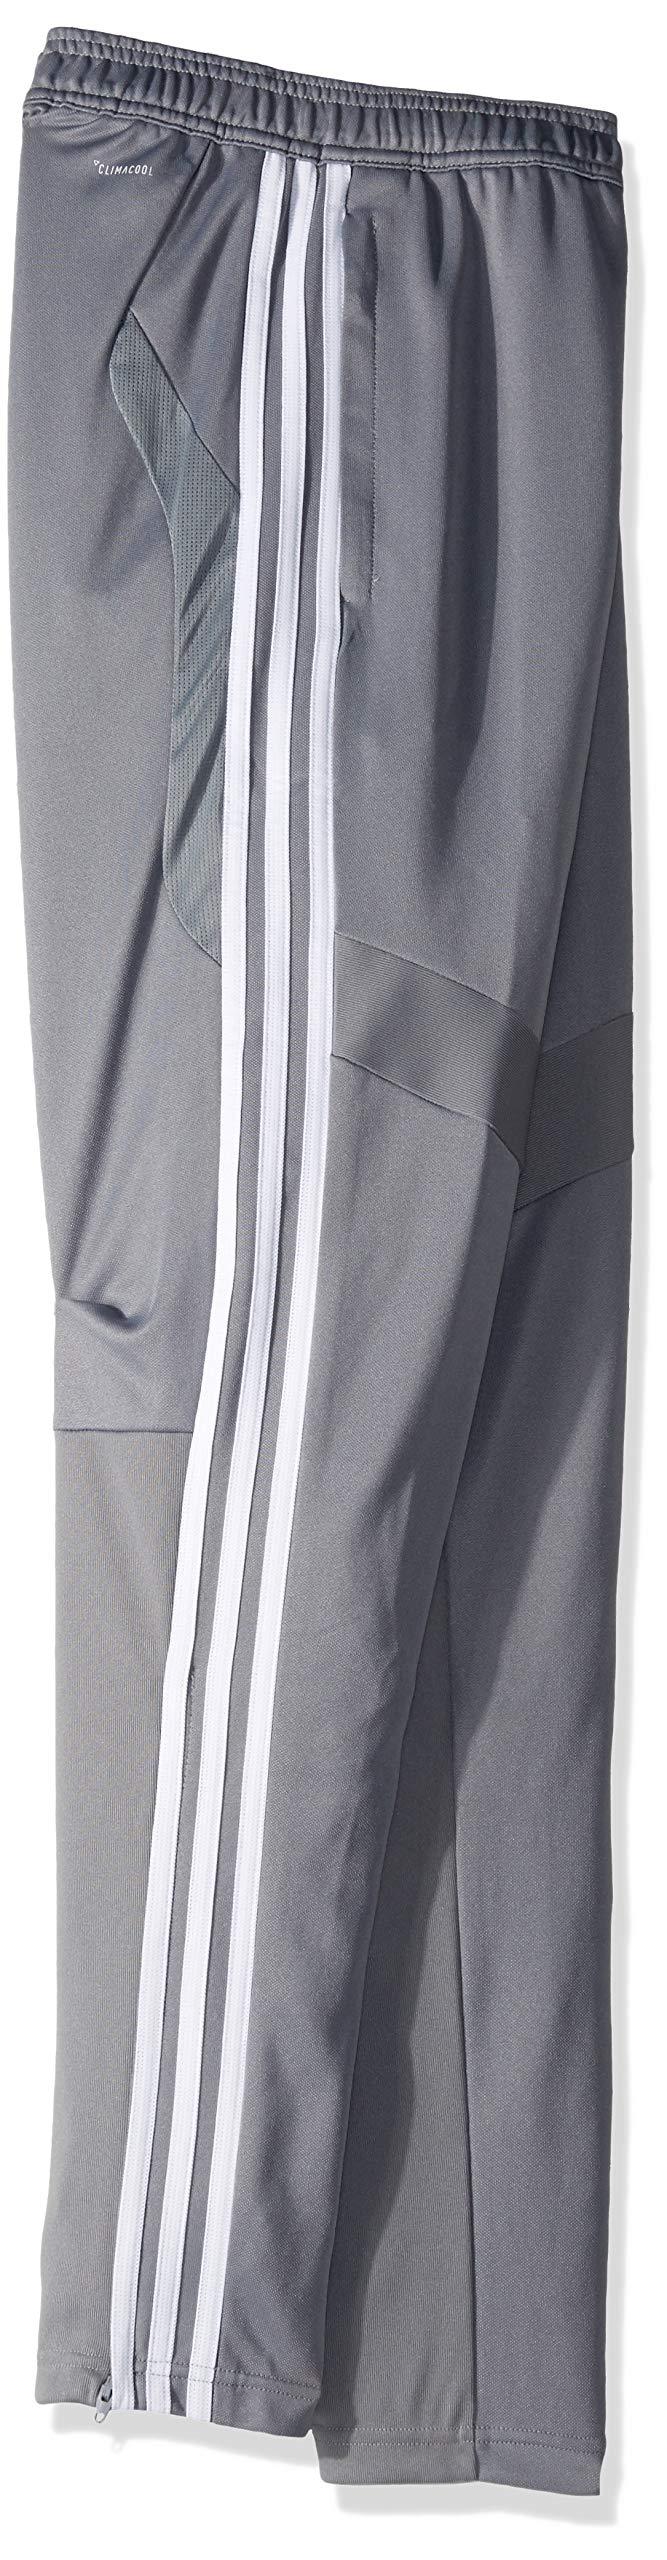 adidas Youth Tiro19 Youth Training Pants, Grey/White, XX-Small by adidas (Image #2)